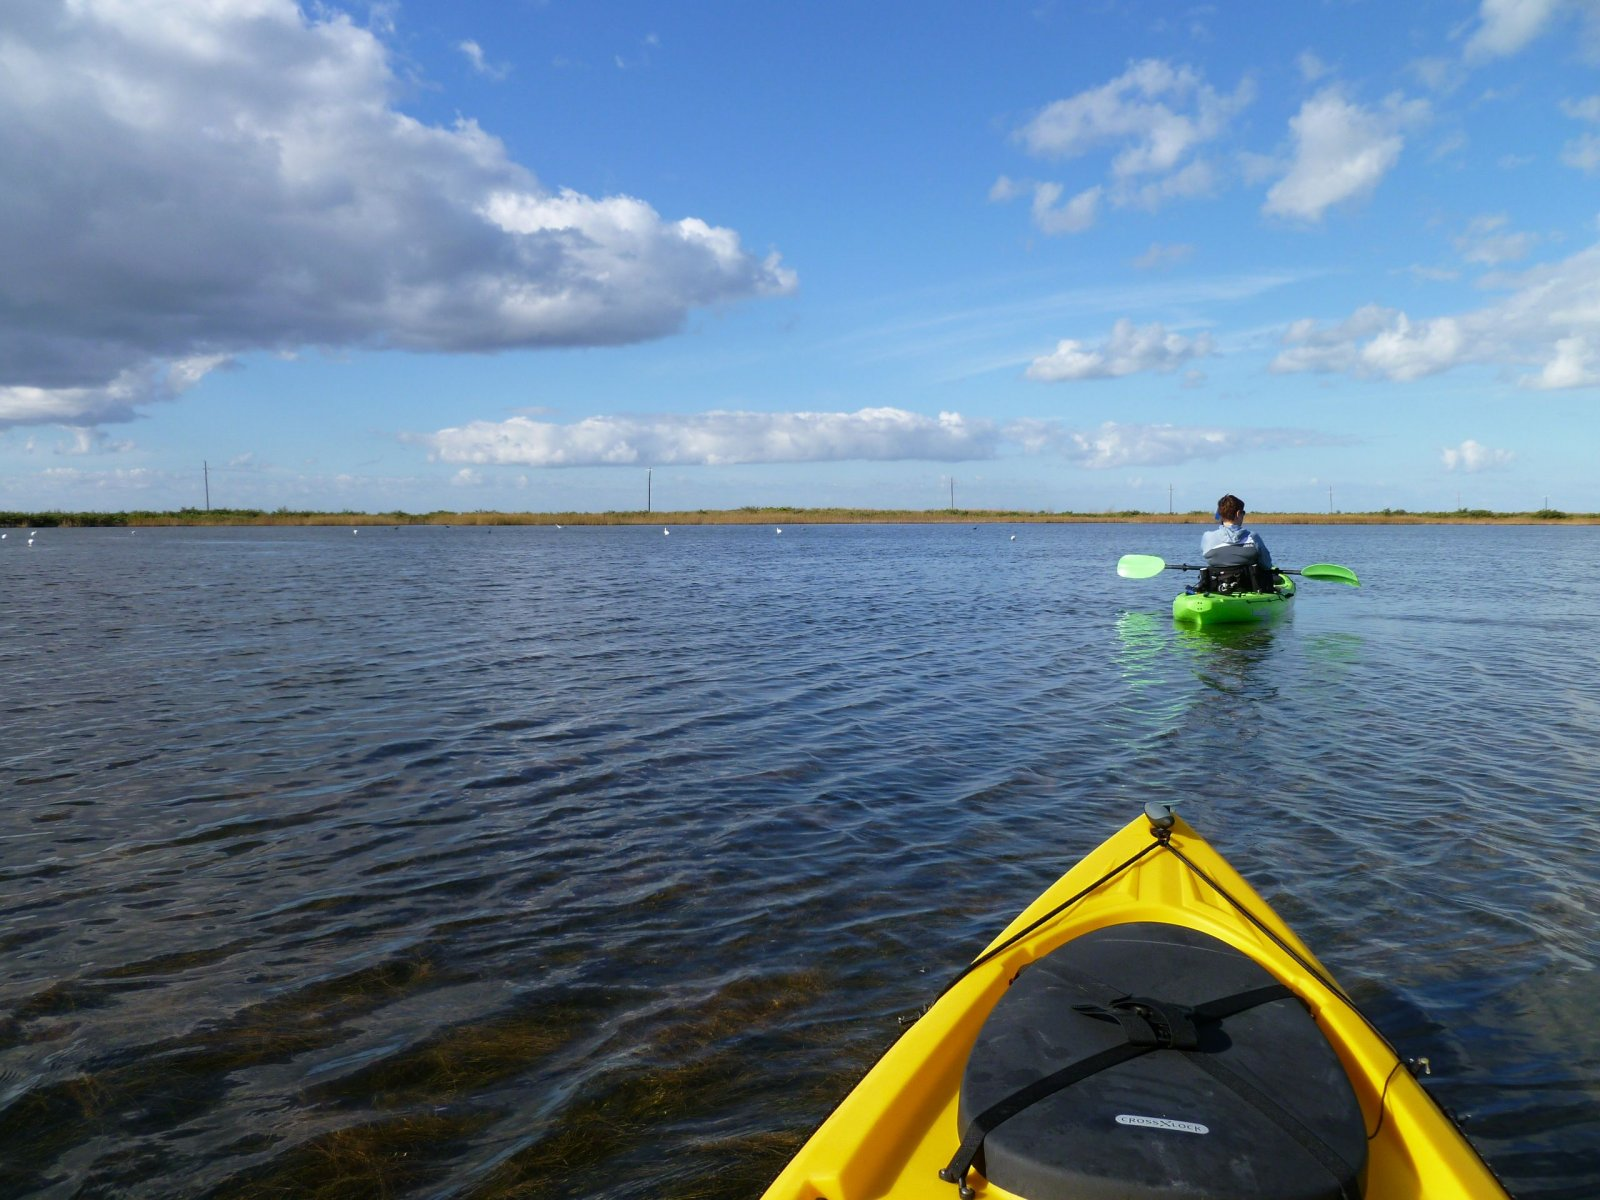 Click image for larger version  Name:kayak.jpg Views:64 Size:278.5 KB ID:154152